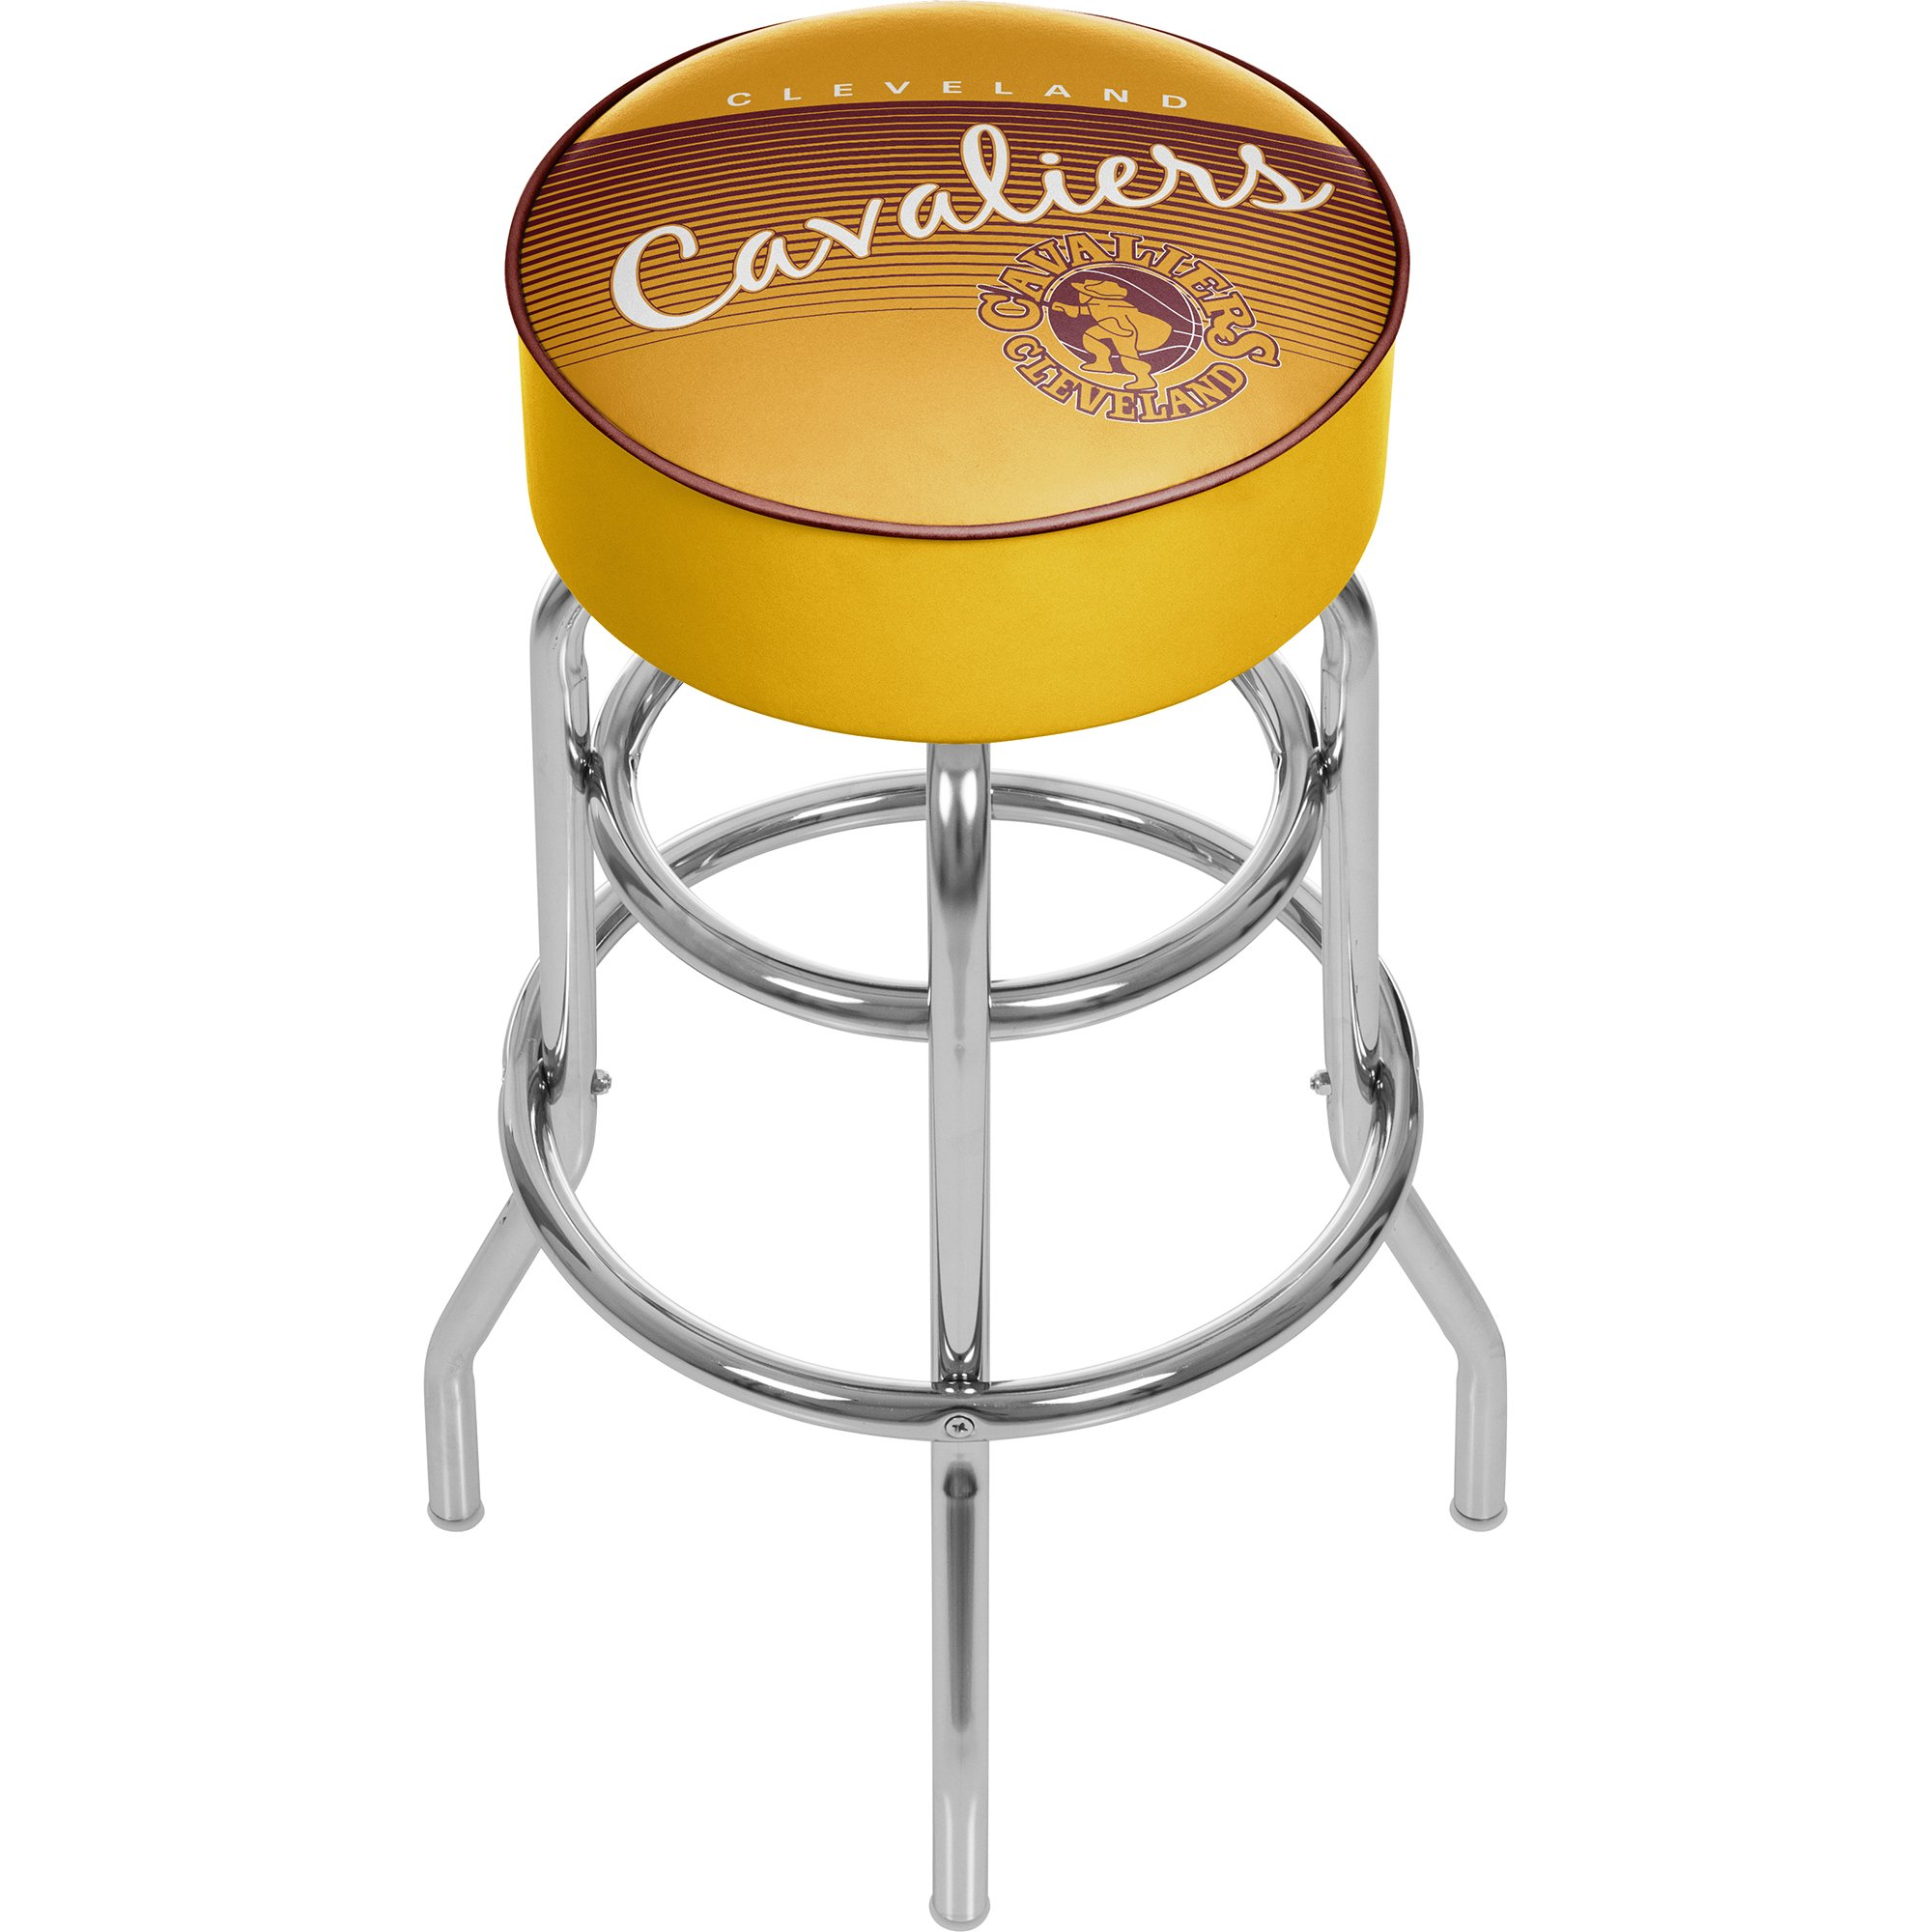 Trademark Global NBA Cleveland Cavaliers Hardwood Classics Padded Swivel Stool, One Size, Chrome